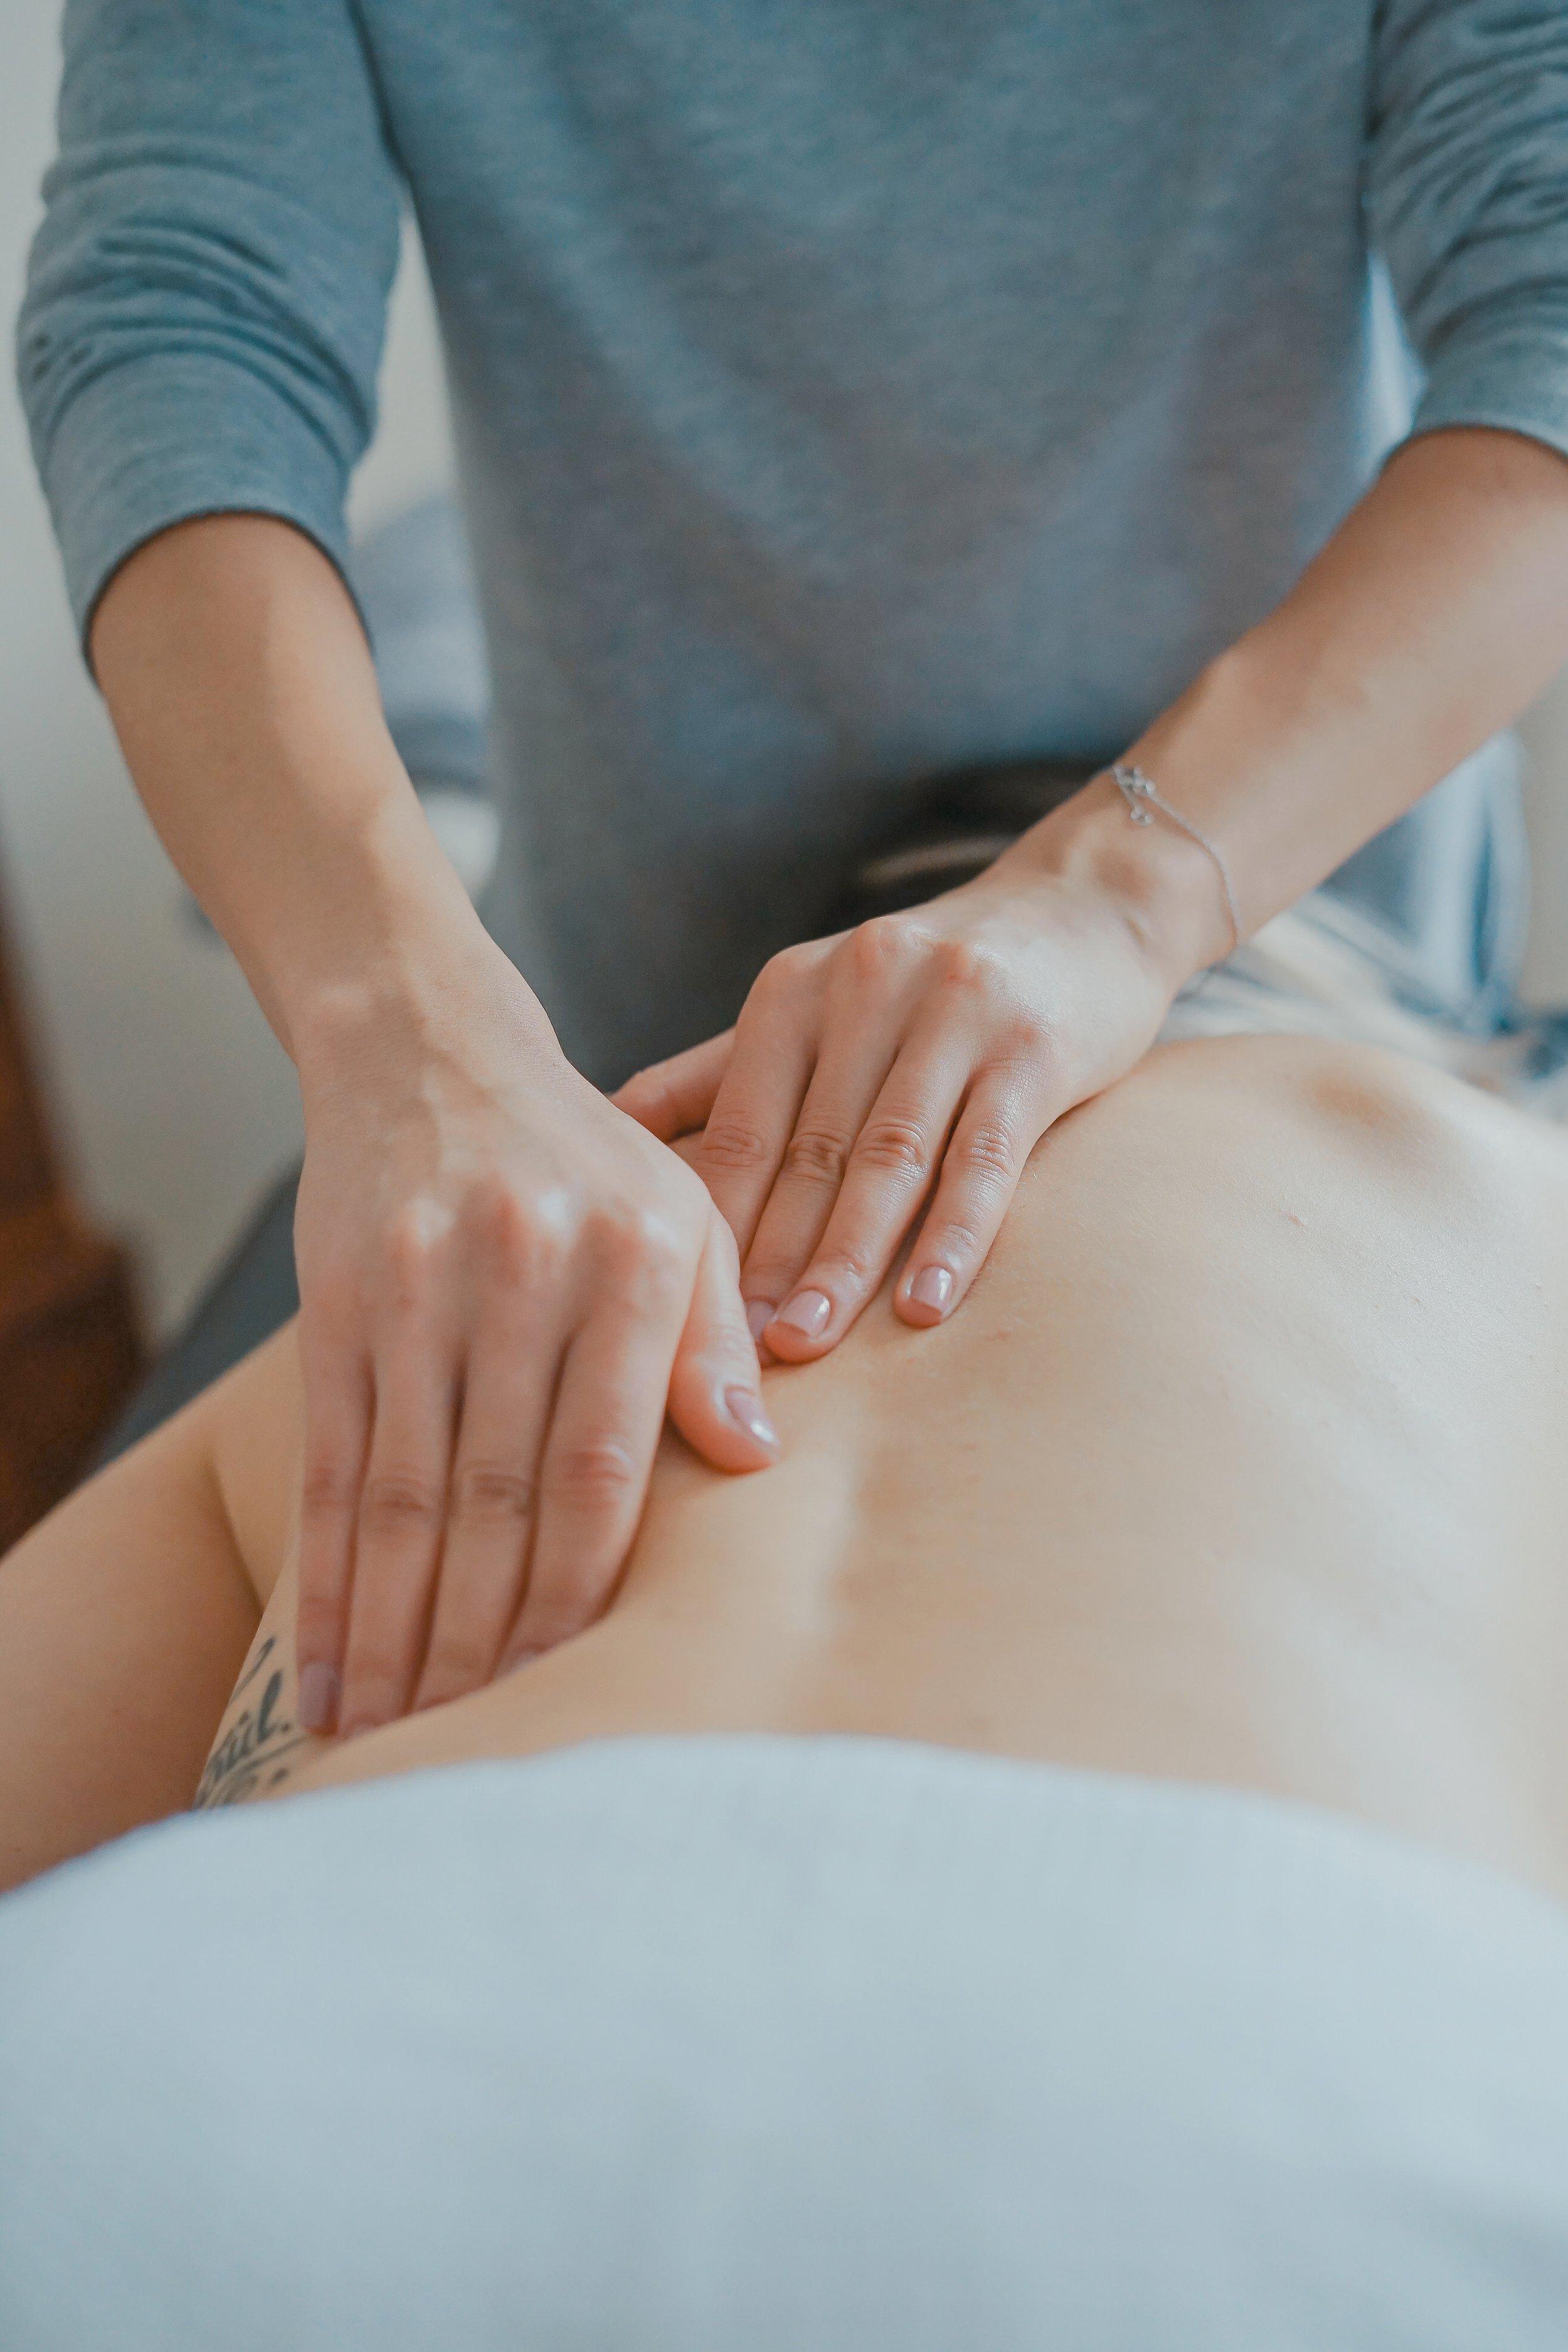 General Aesthetics Course  40 weeks. Starting September, 2019